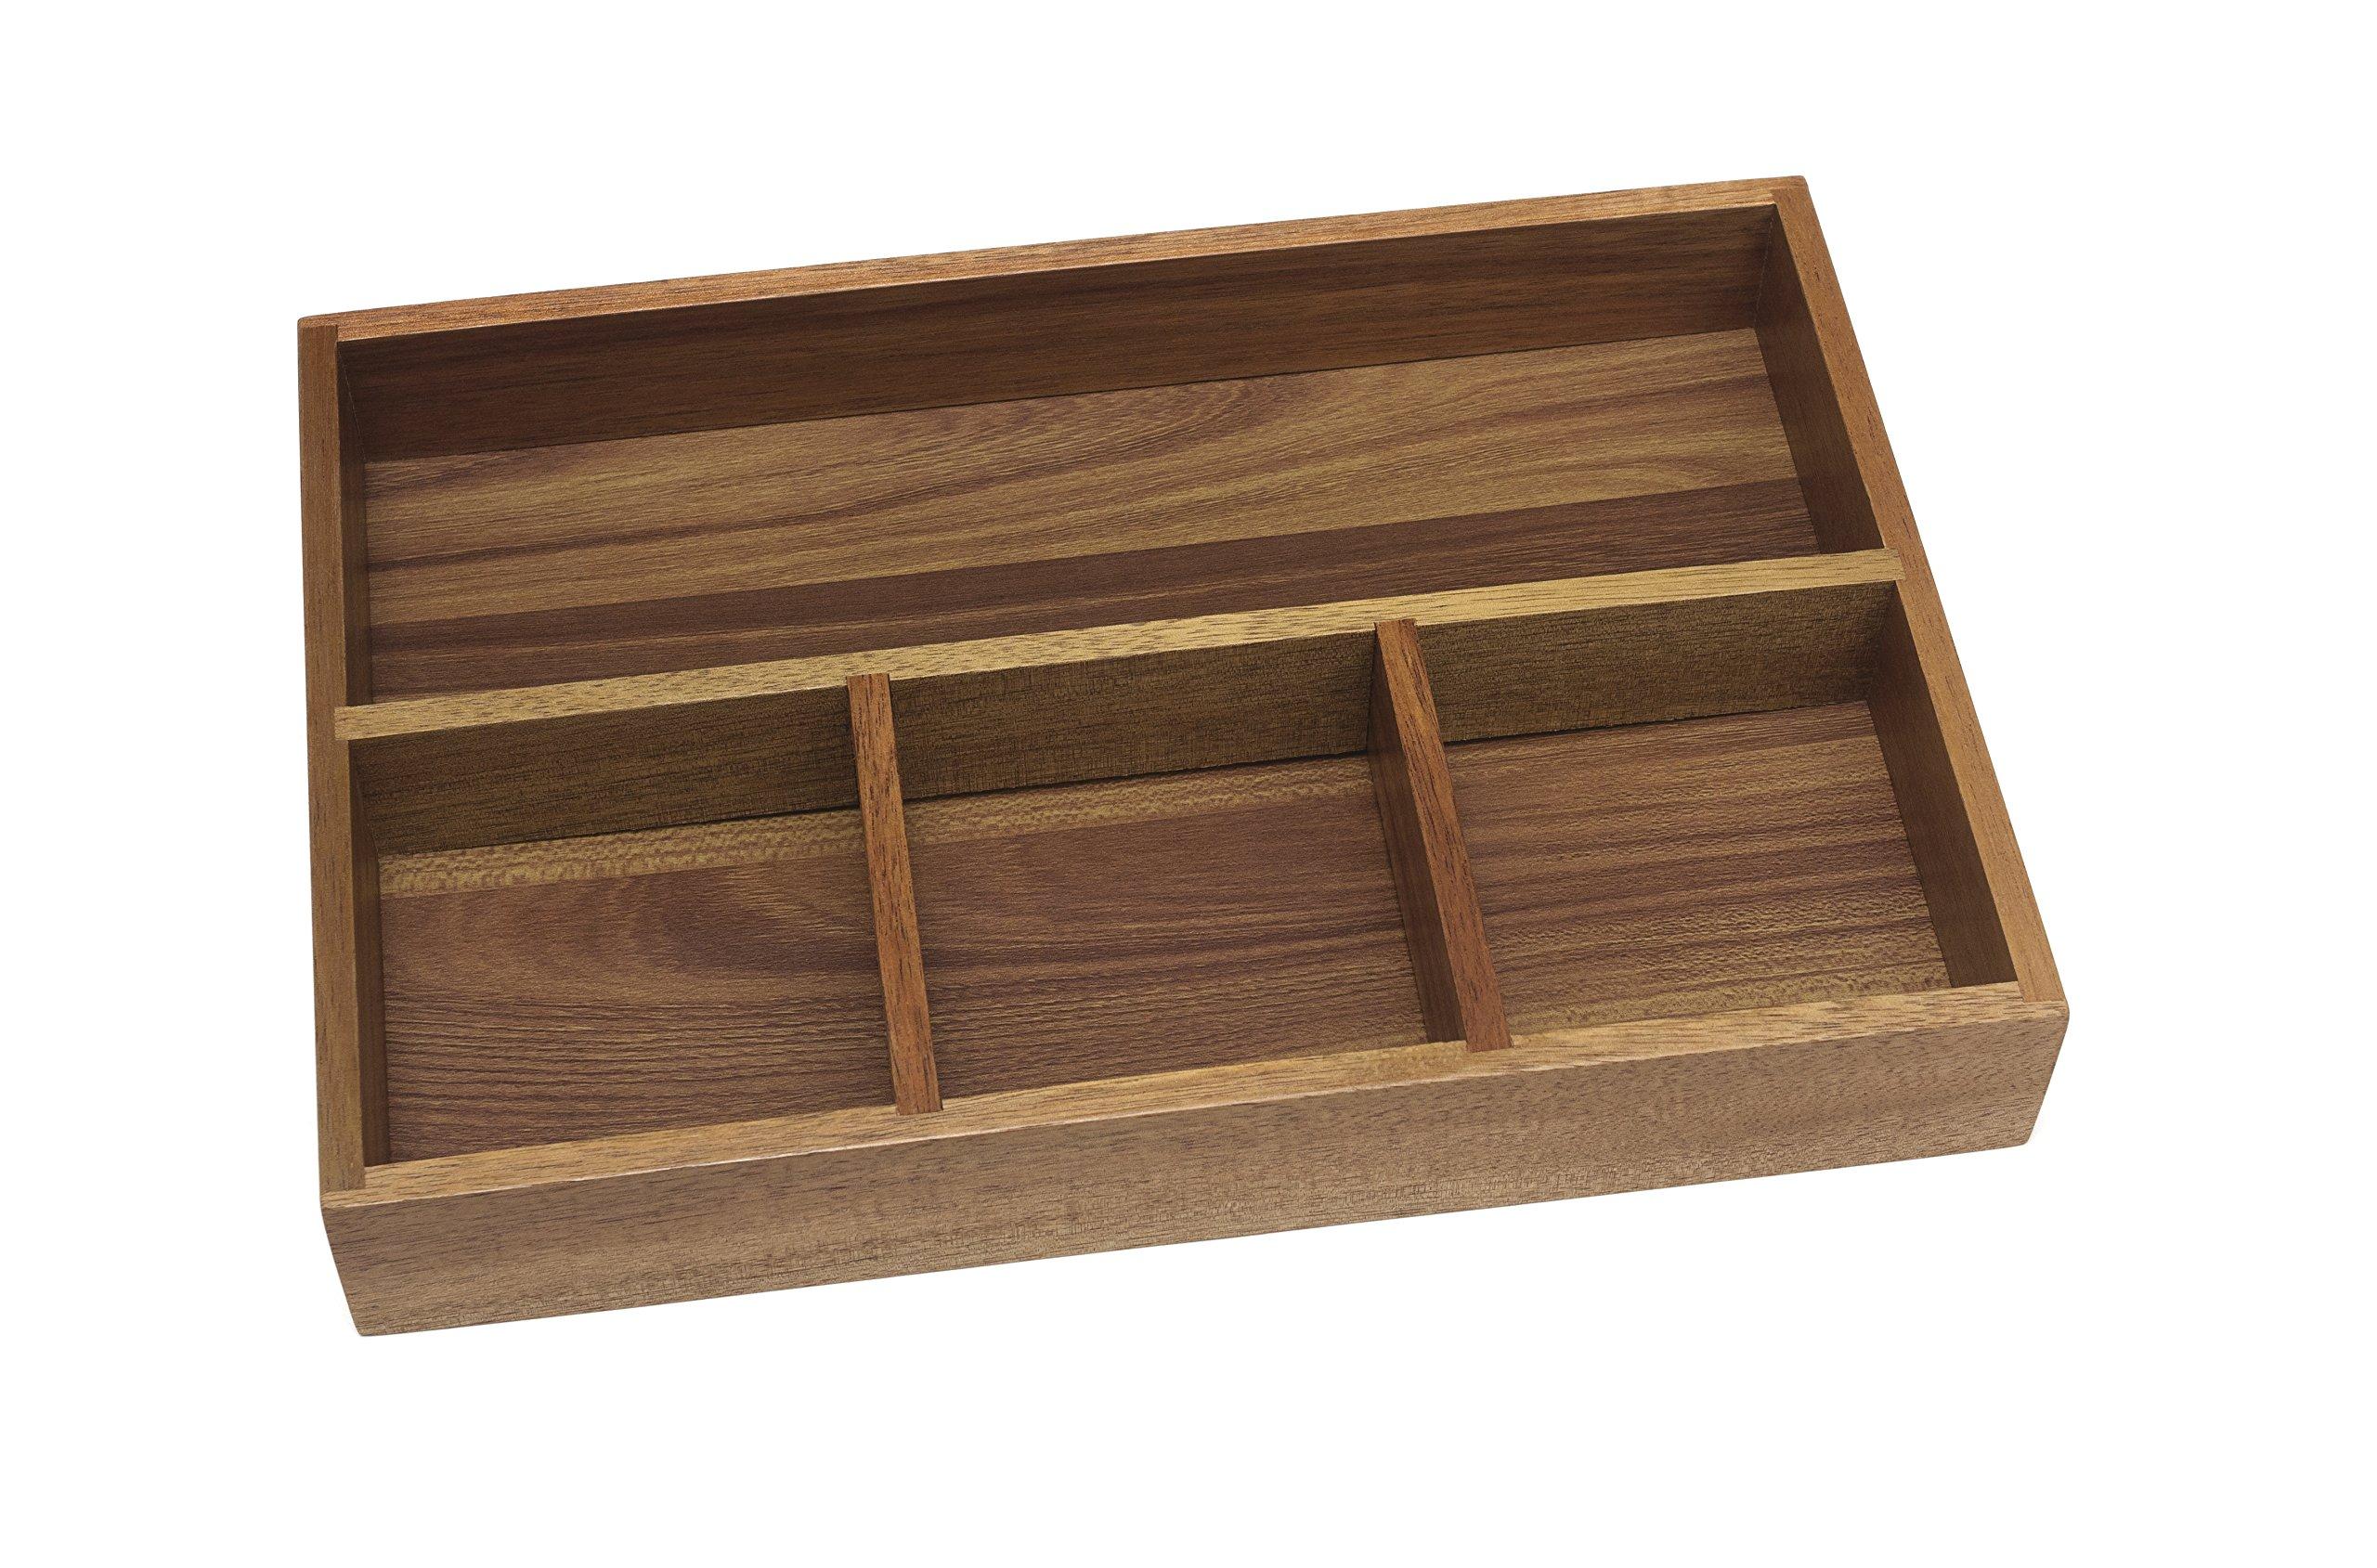 Lipper International 1124 Acacia Organizer Tray, 4-Compartments, 12'' x 8'' x 1 3/4''